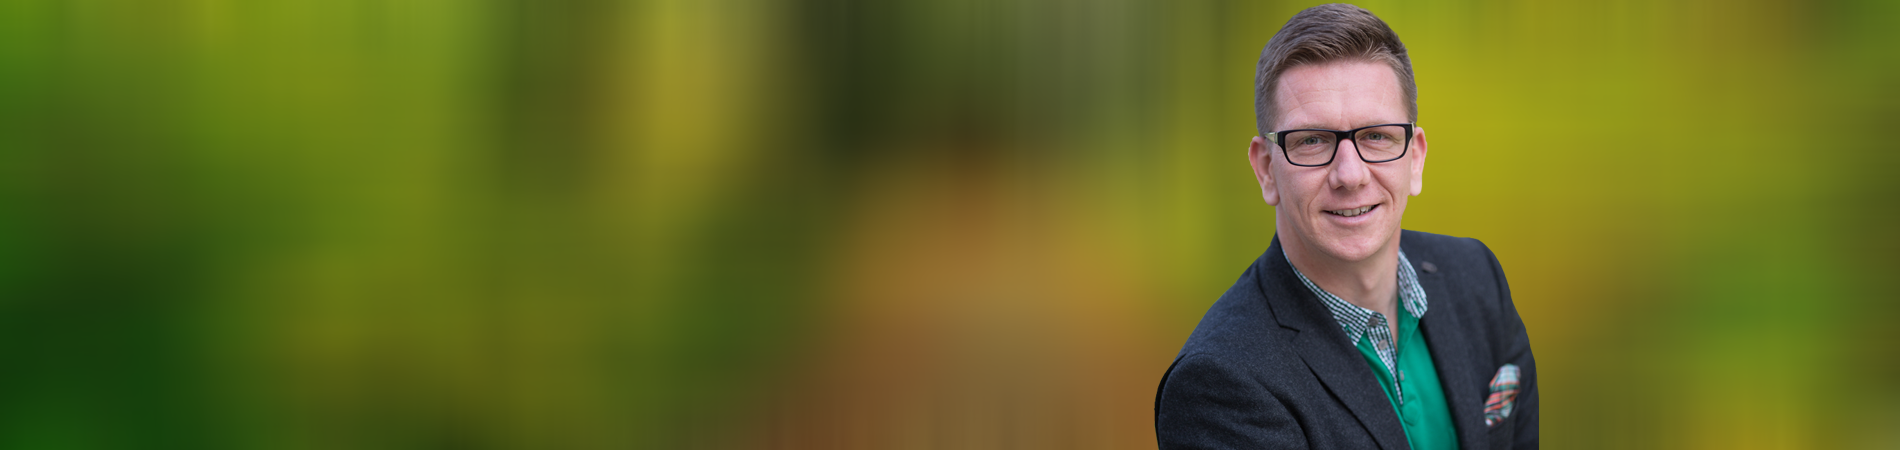 stoll-portrait2-1